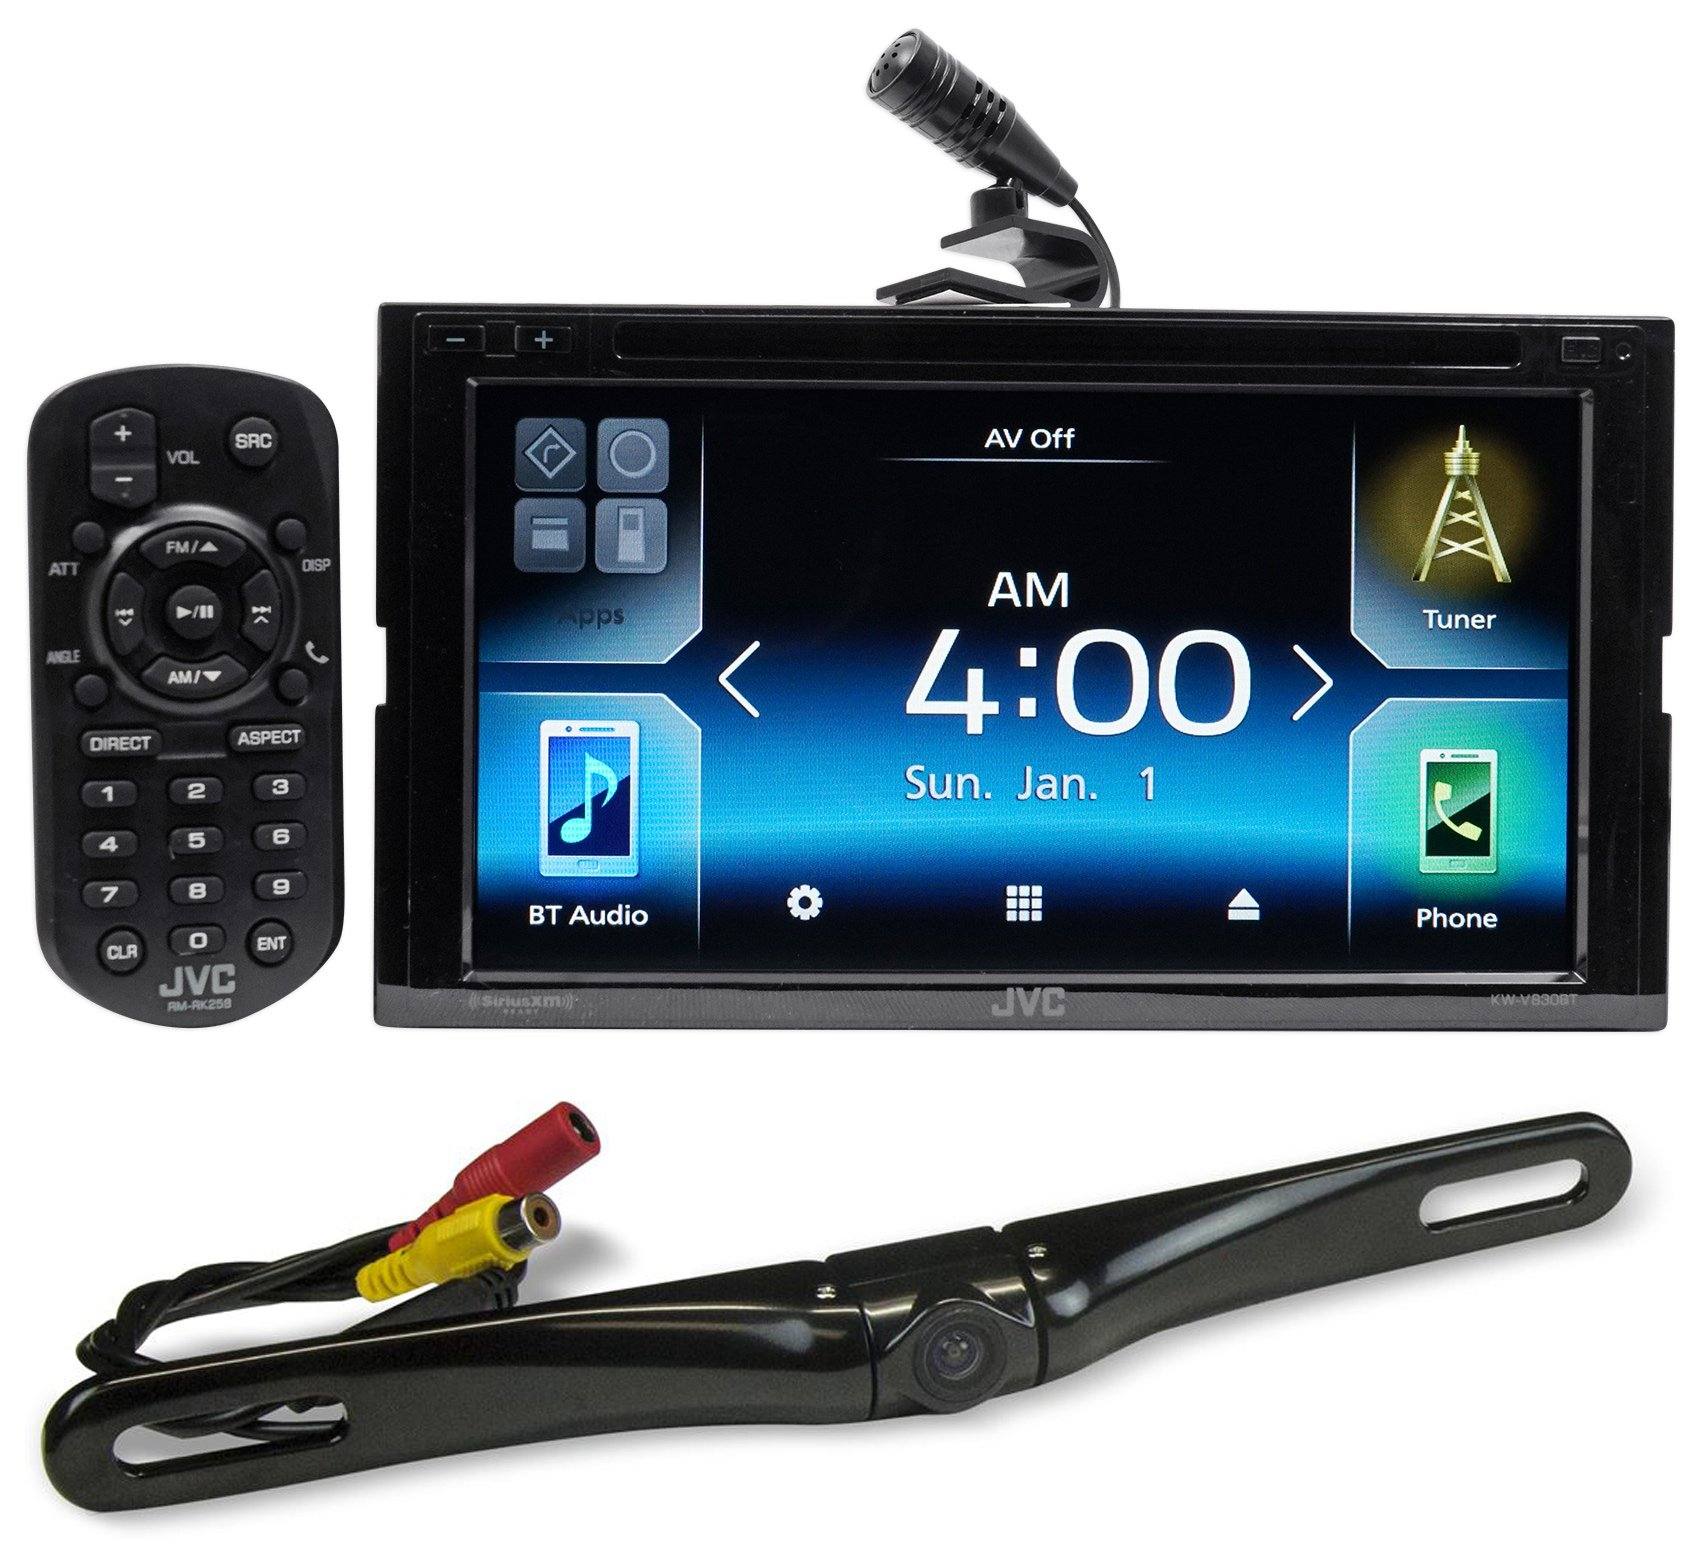 JVC KW-V830BT 6.8'' Car DVD Bluetooth Receiver Android, Carplay, Dual USB+Camera